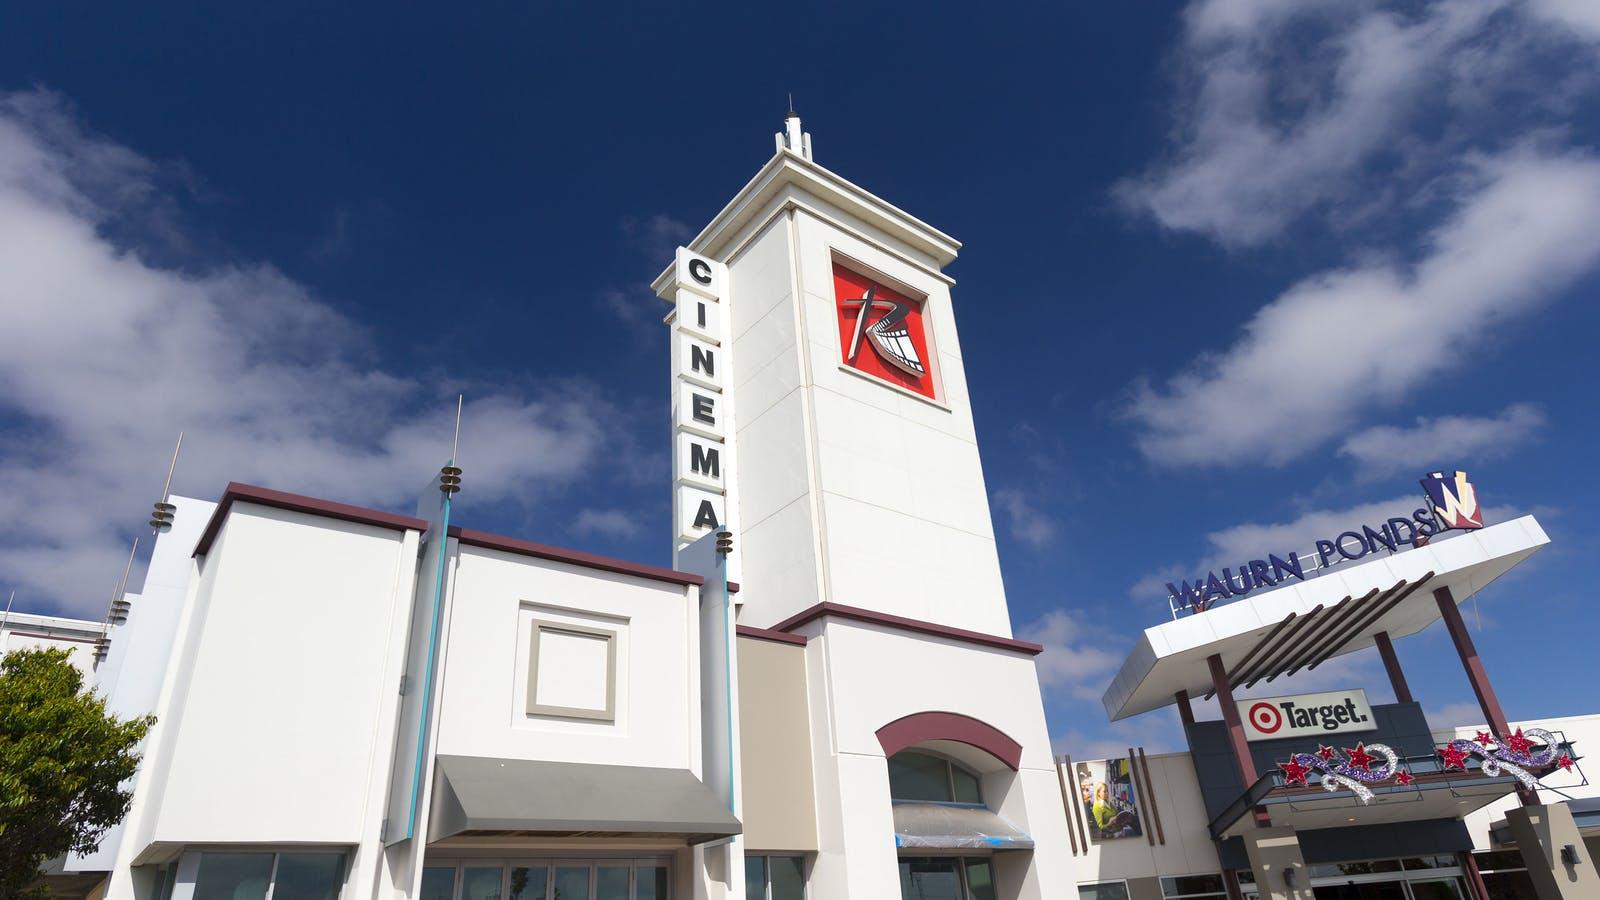 Reading Cinema + Target Entry